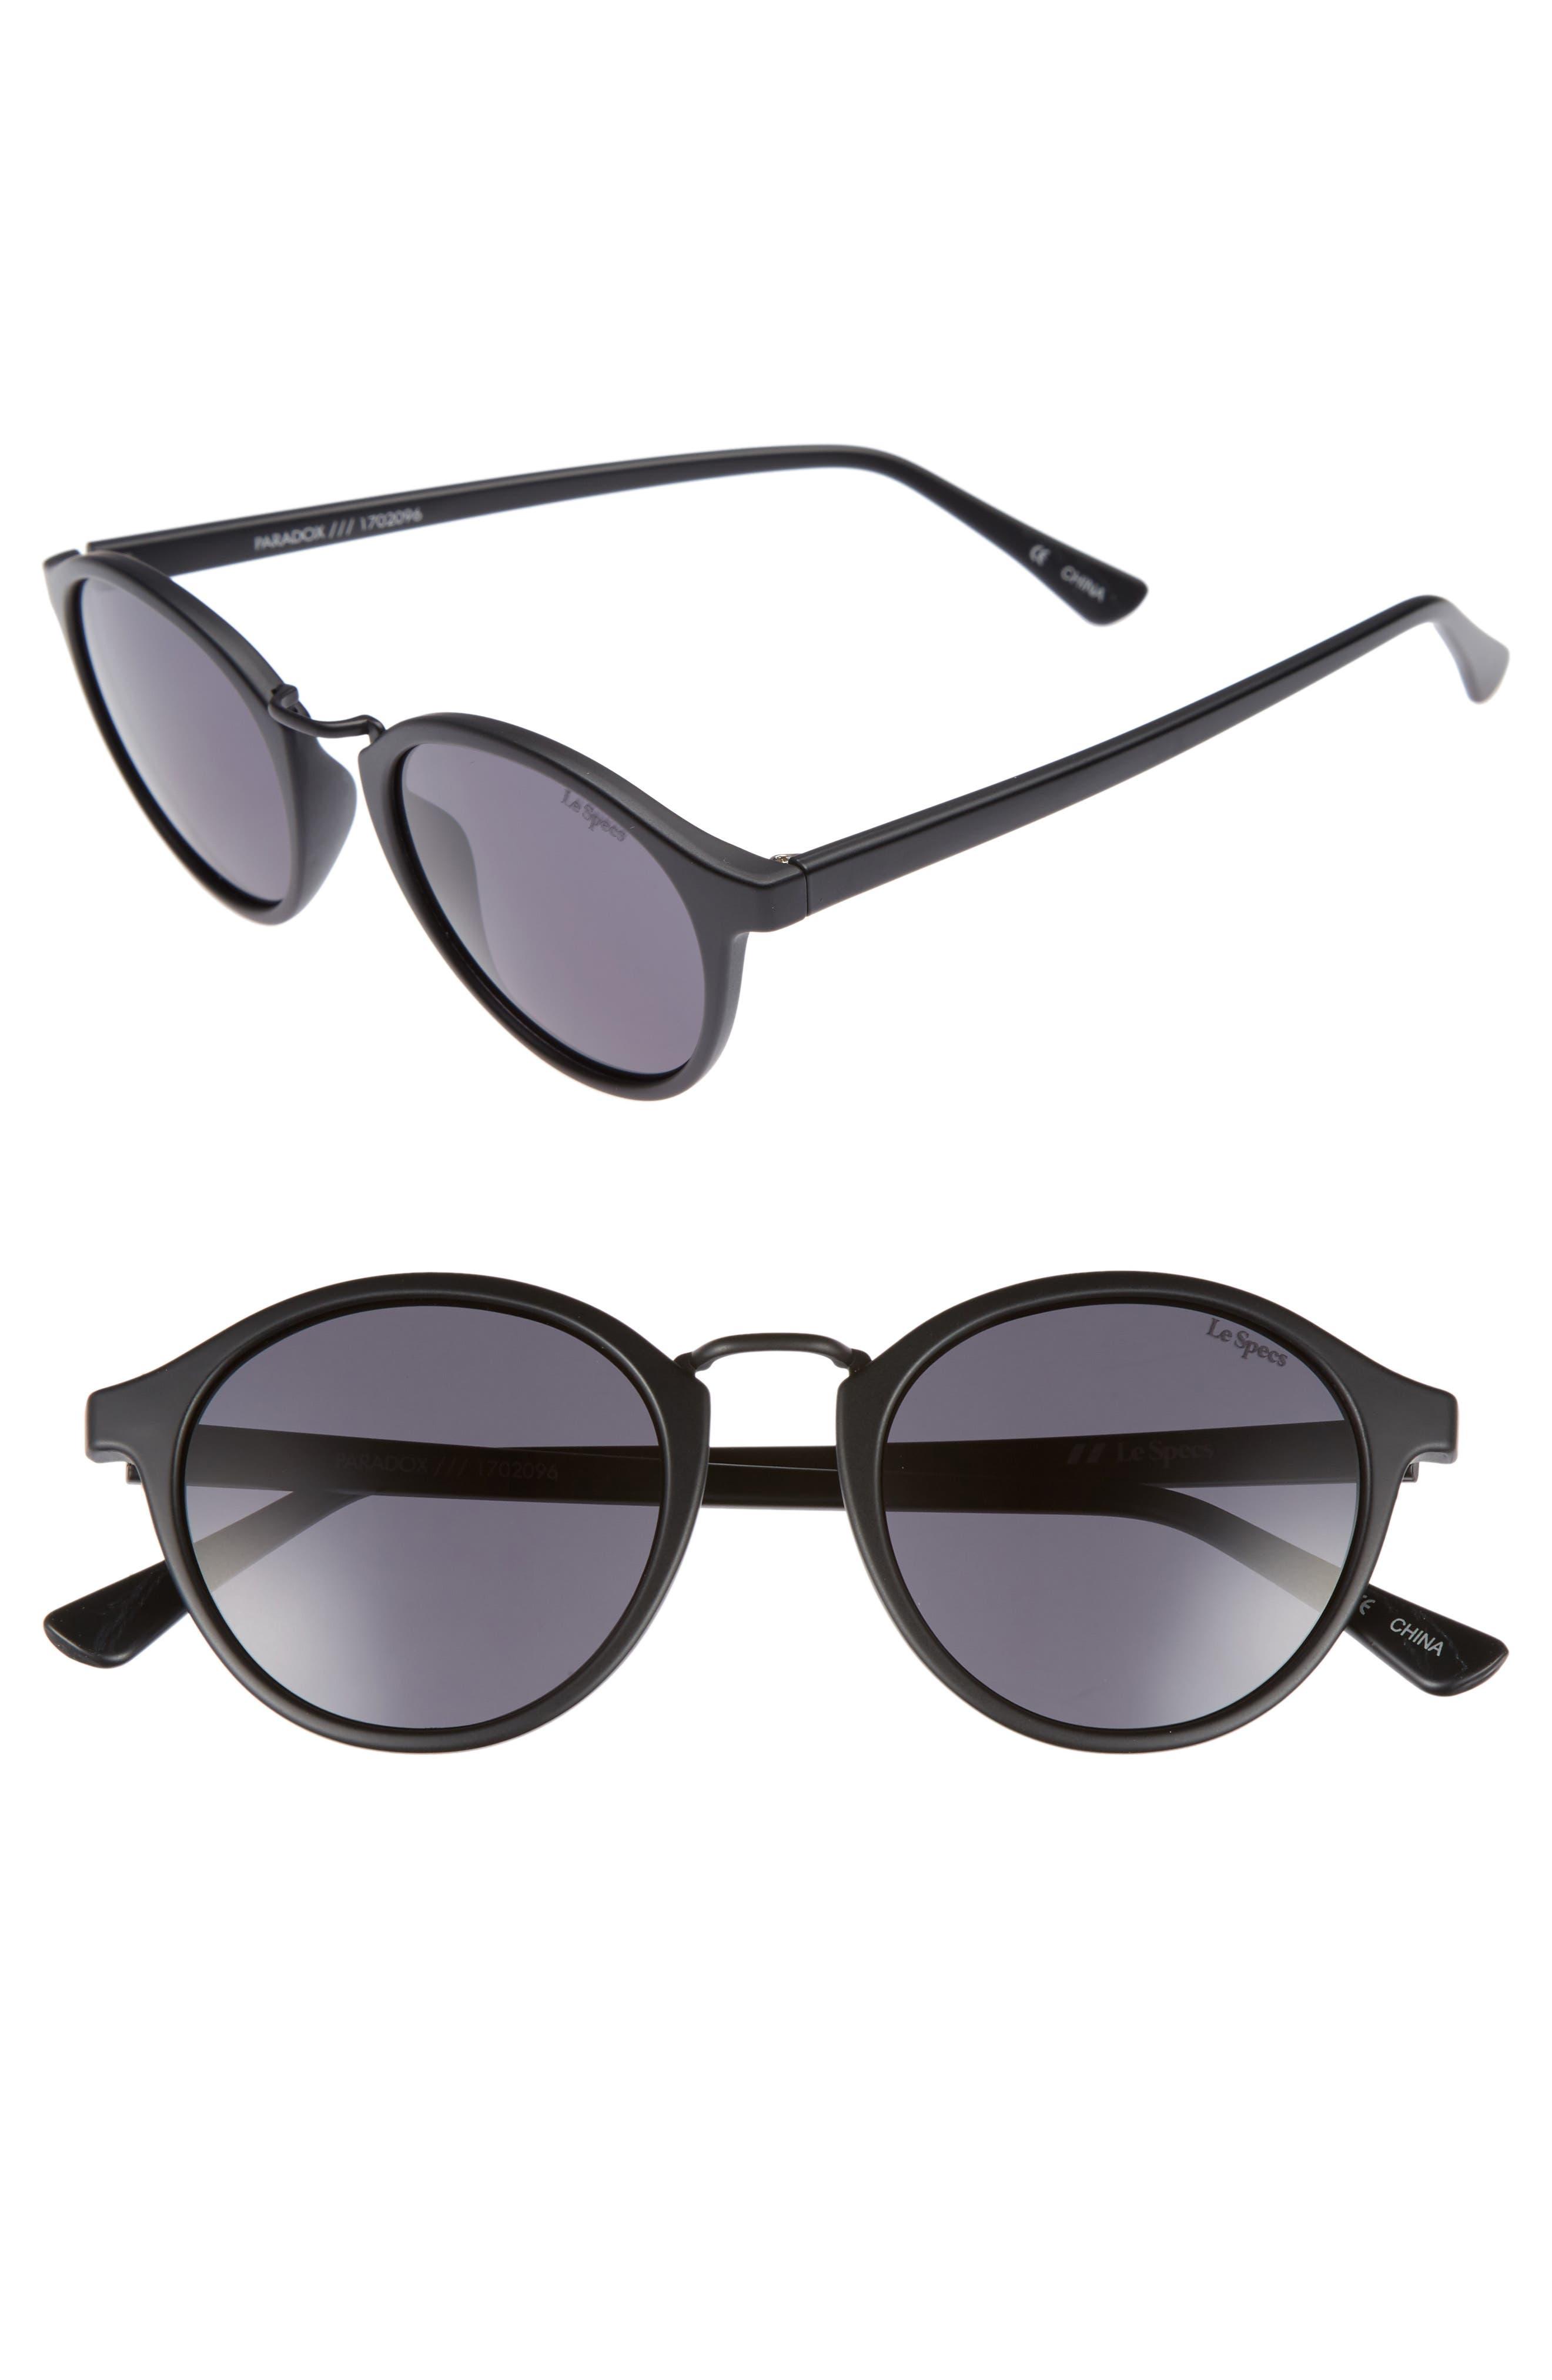 Paradox 49mm Oval Sunglasses,                         Main,                         color, Matte Black